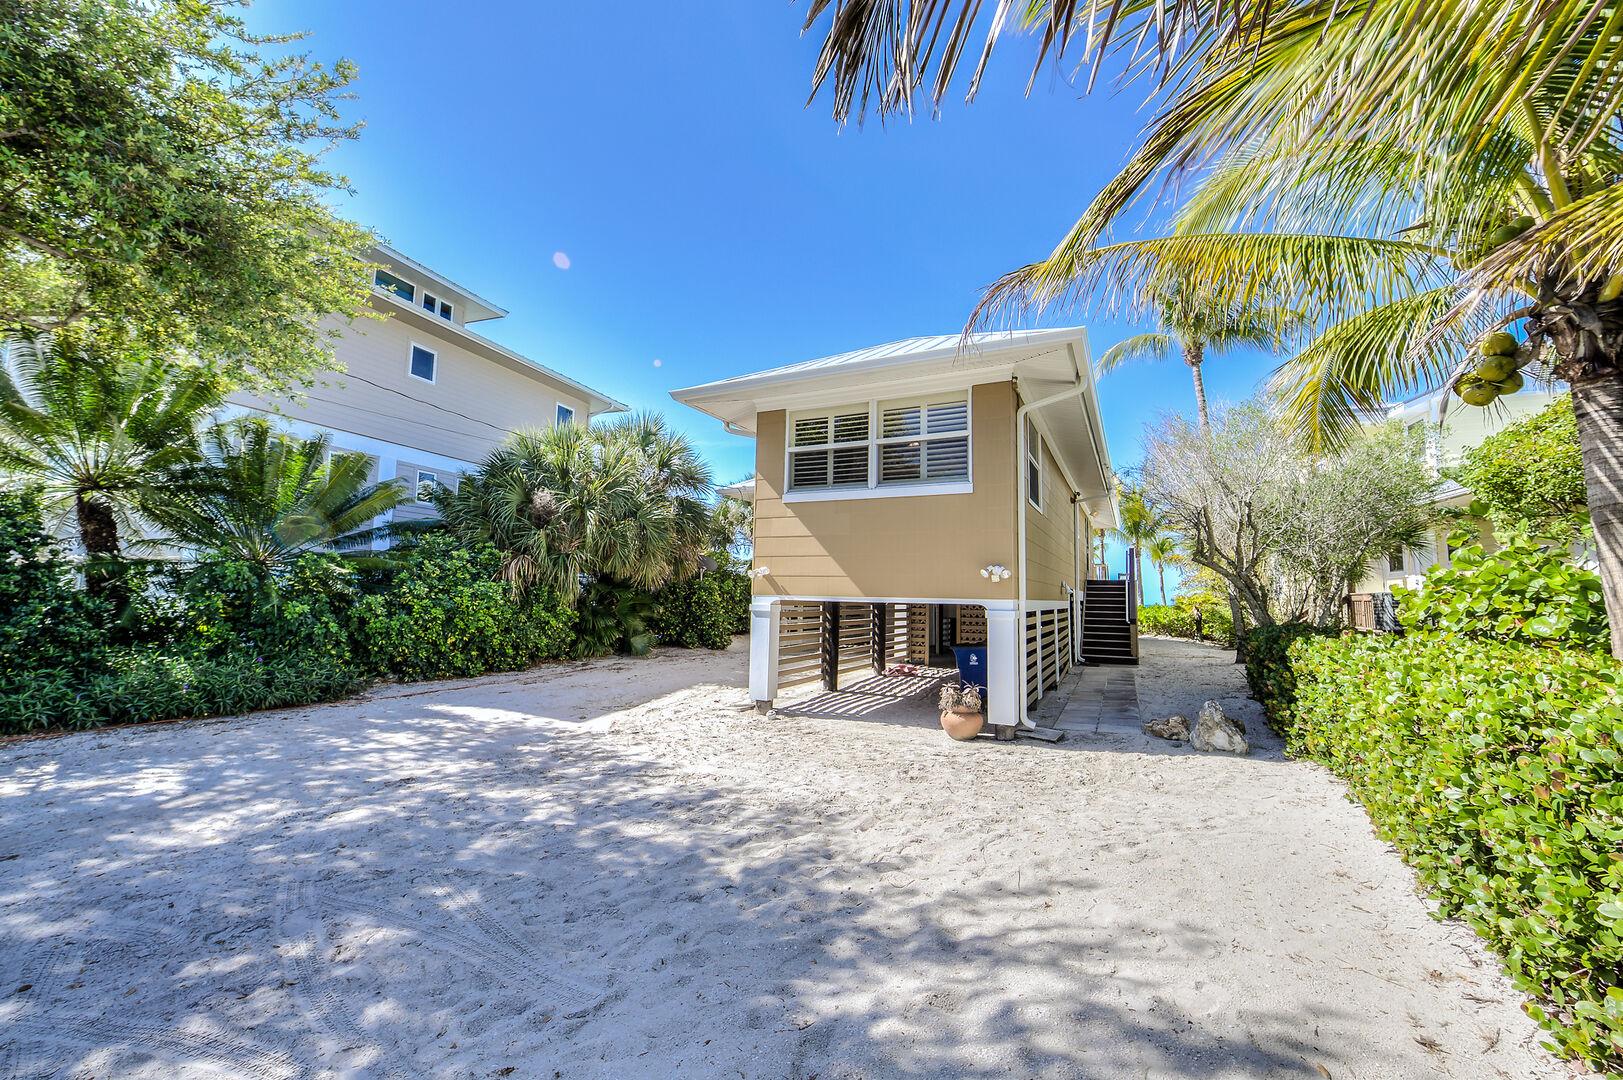 Crow's Nest Parking Fort Myers Beach Rental